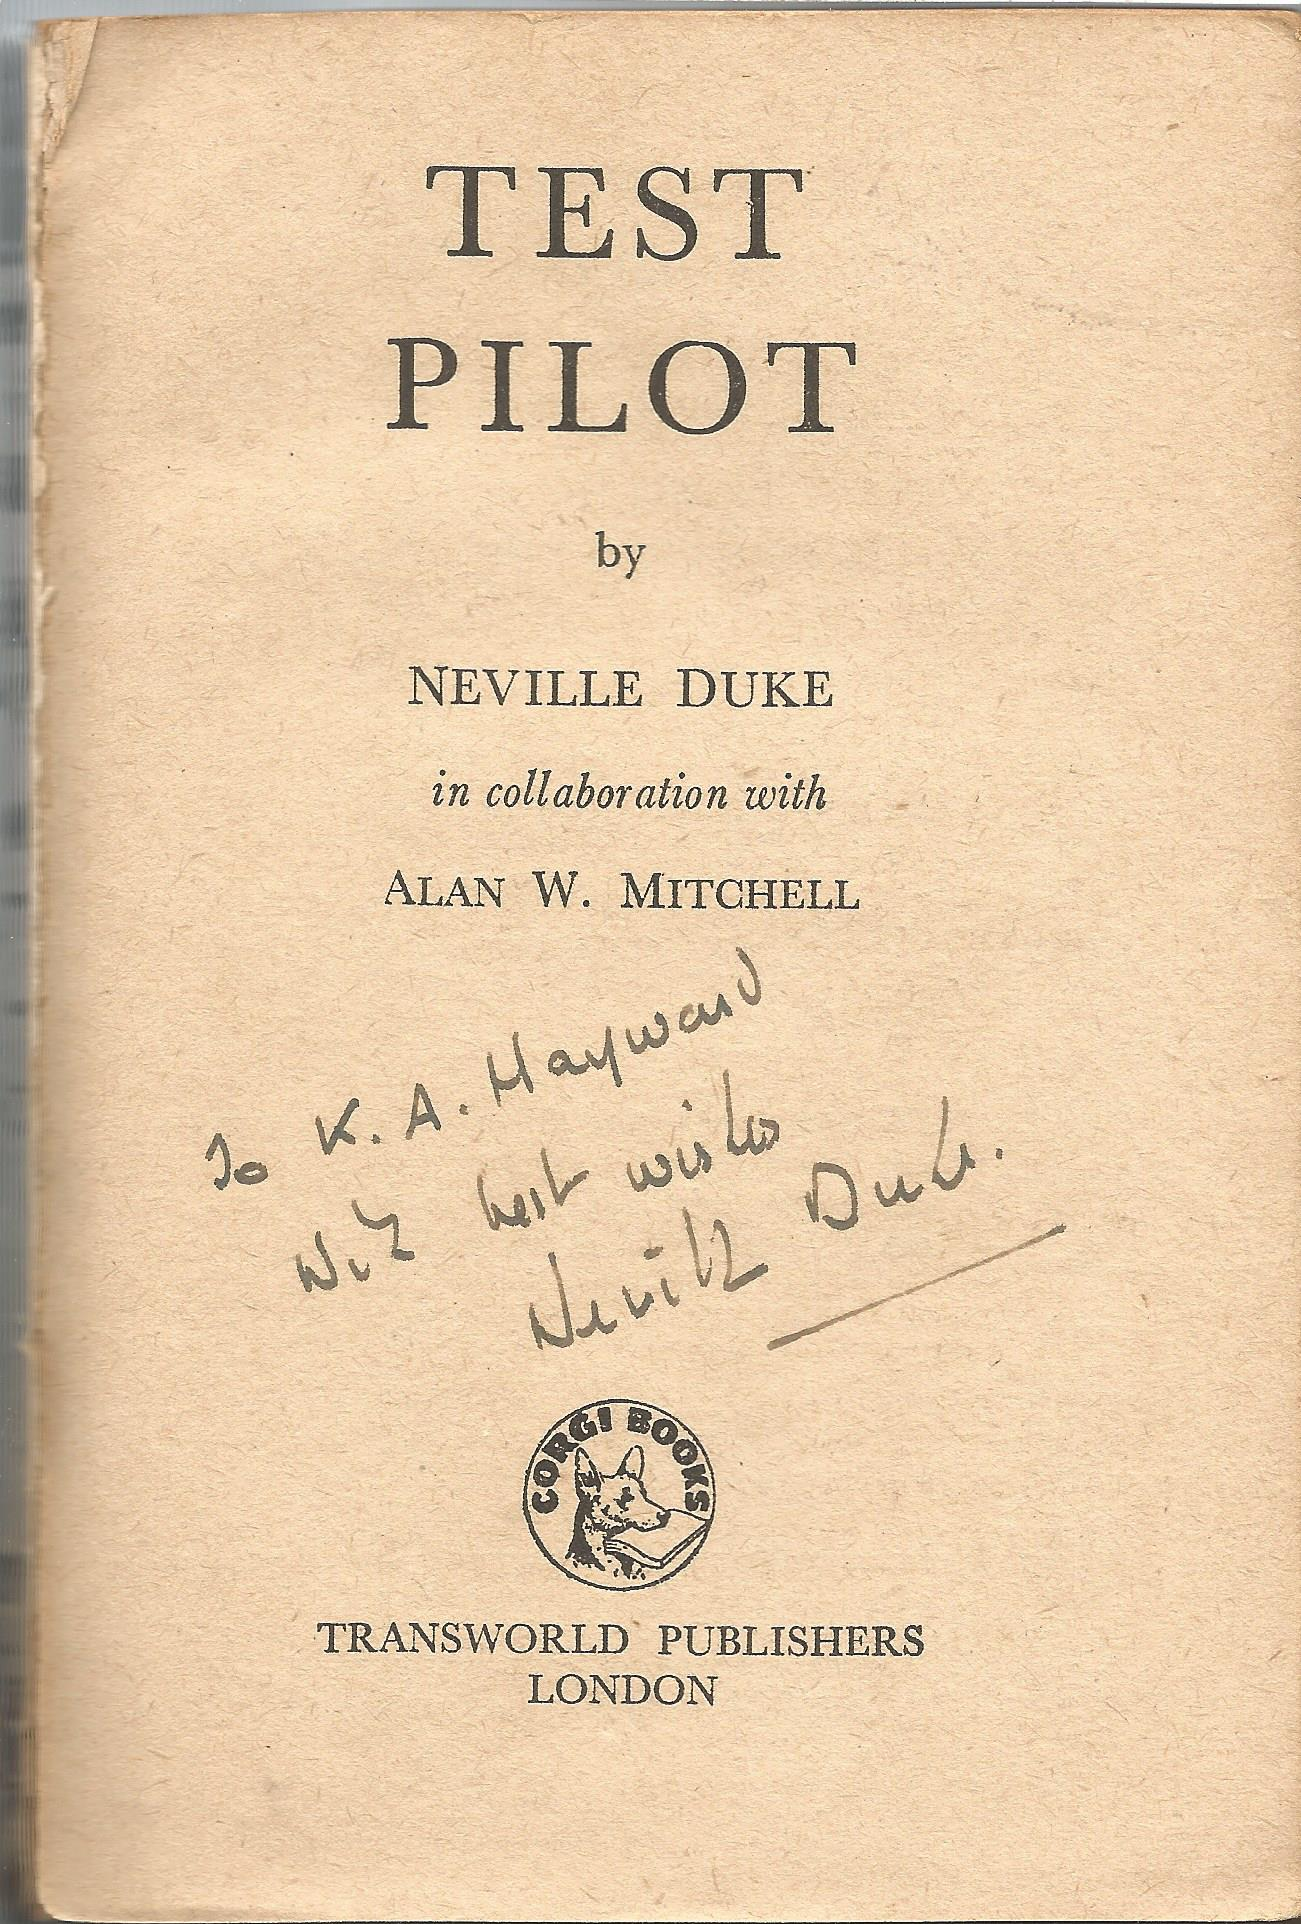 Sqn Ldr Neville Duke DSO DFC signed paperback book Test Pilot; bit beaten uPOdd loose pages signed - Image 2 of 2